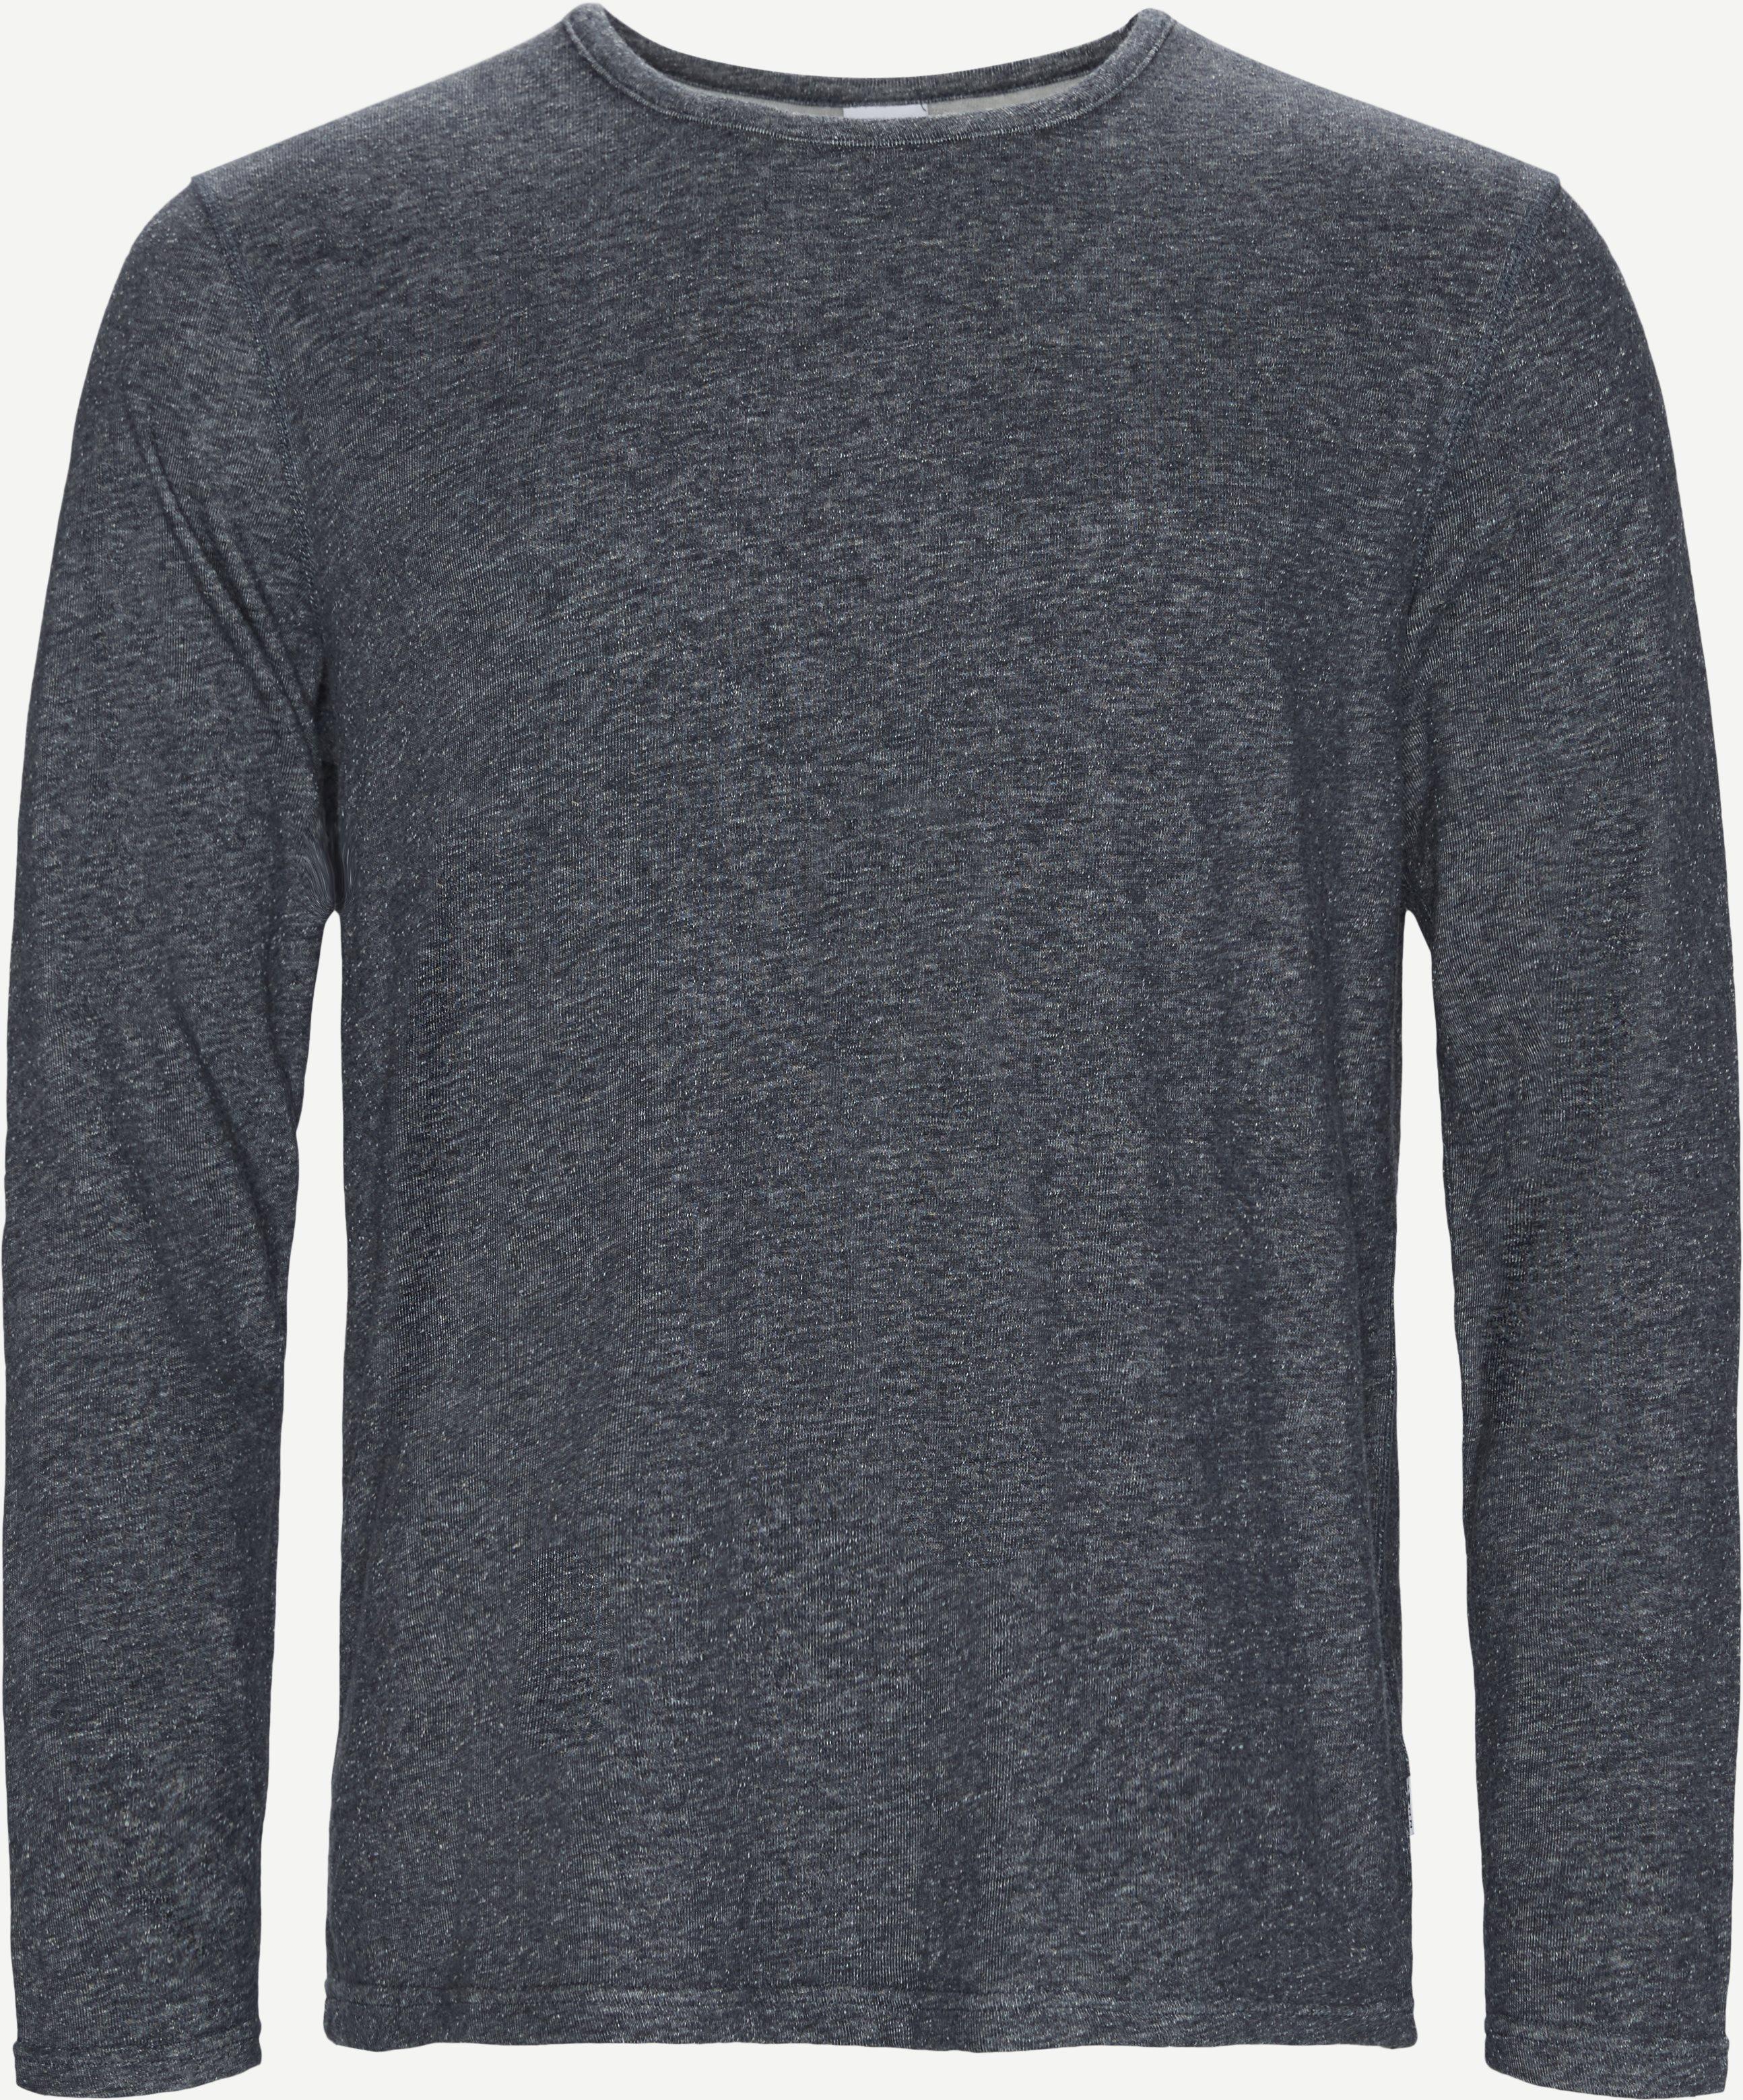 Georg Crewneck Sweatshirt - Sweatshirts - Regular fit - Blå